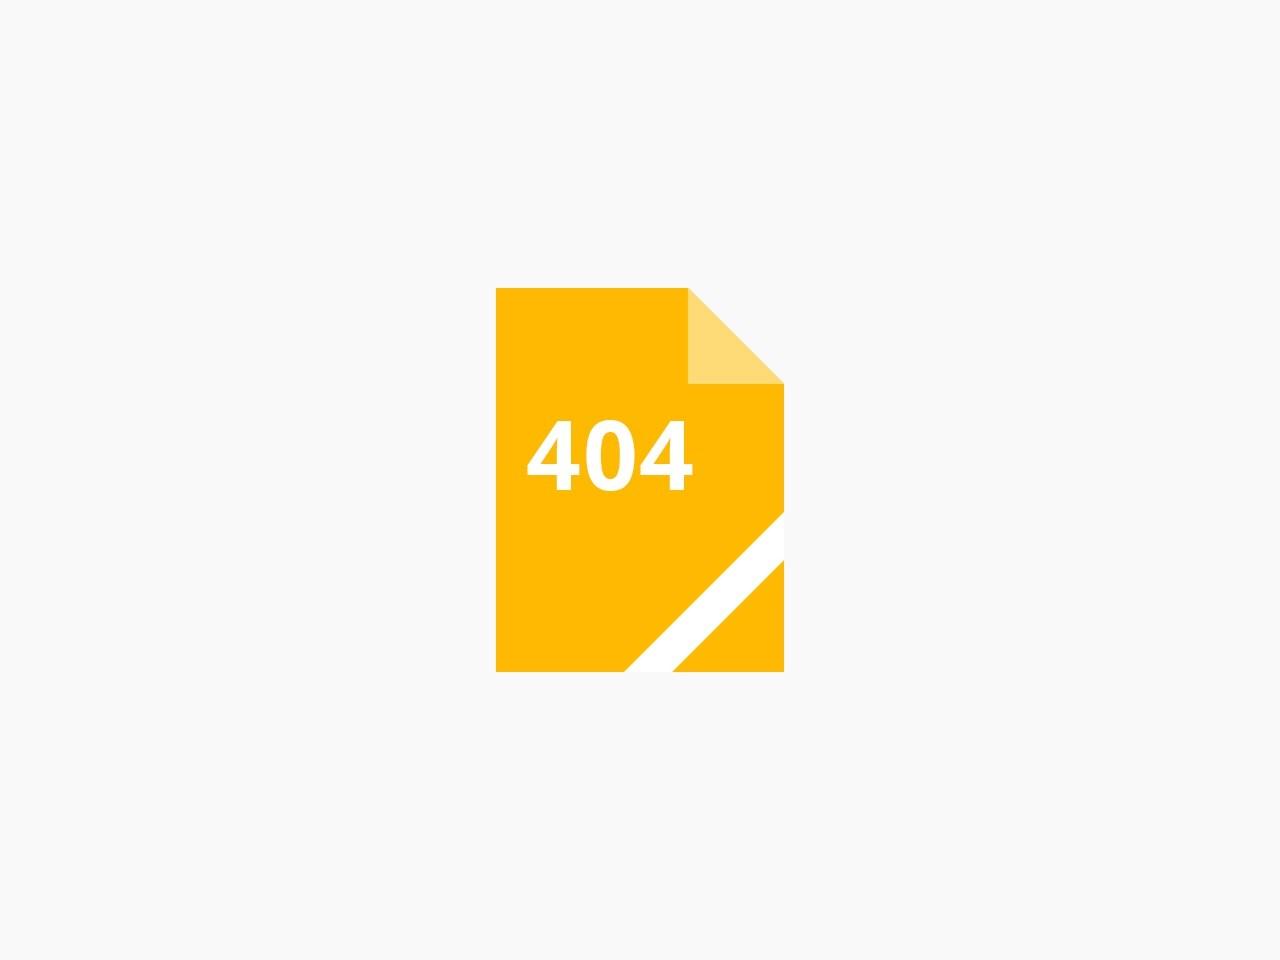 avatar3x